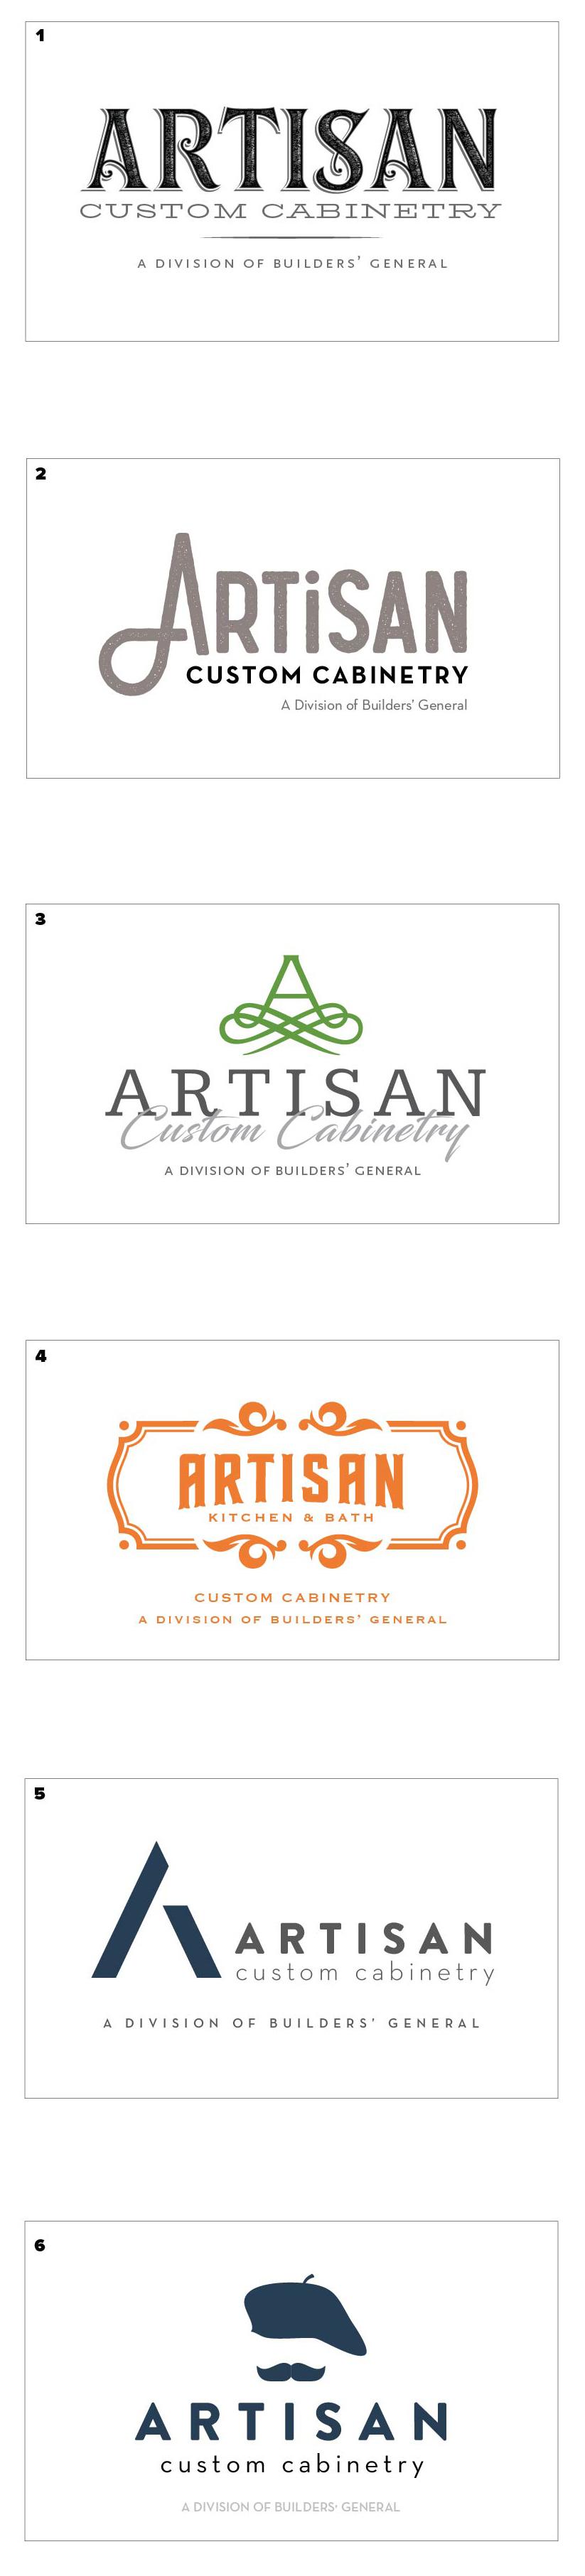 artisan-logo-R1-01.jpg